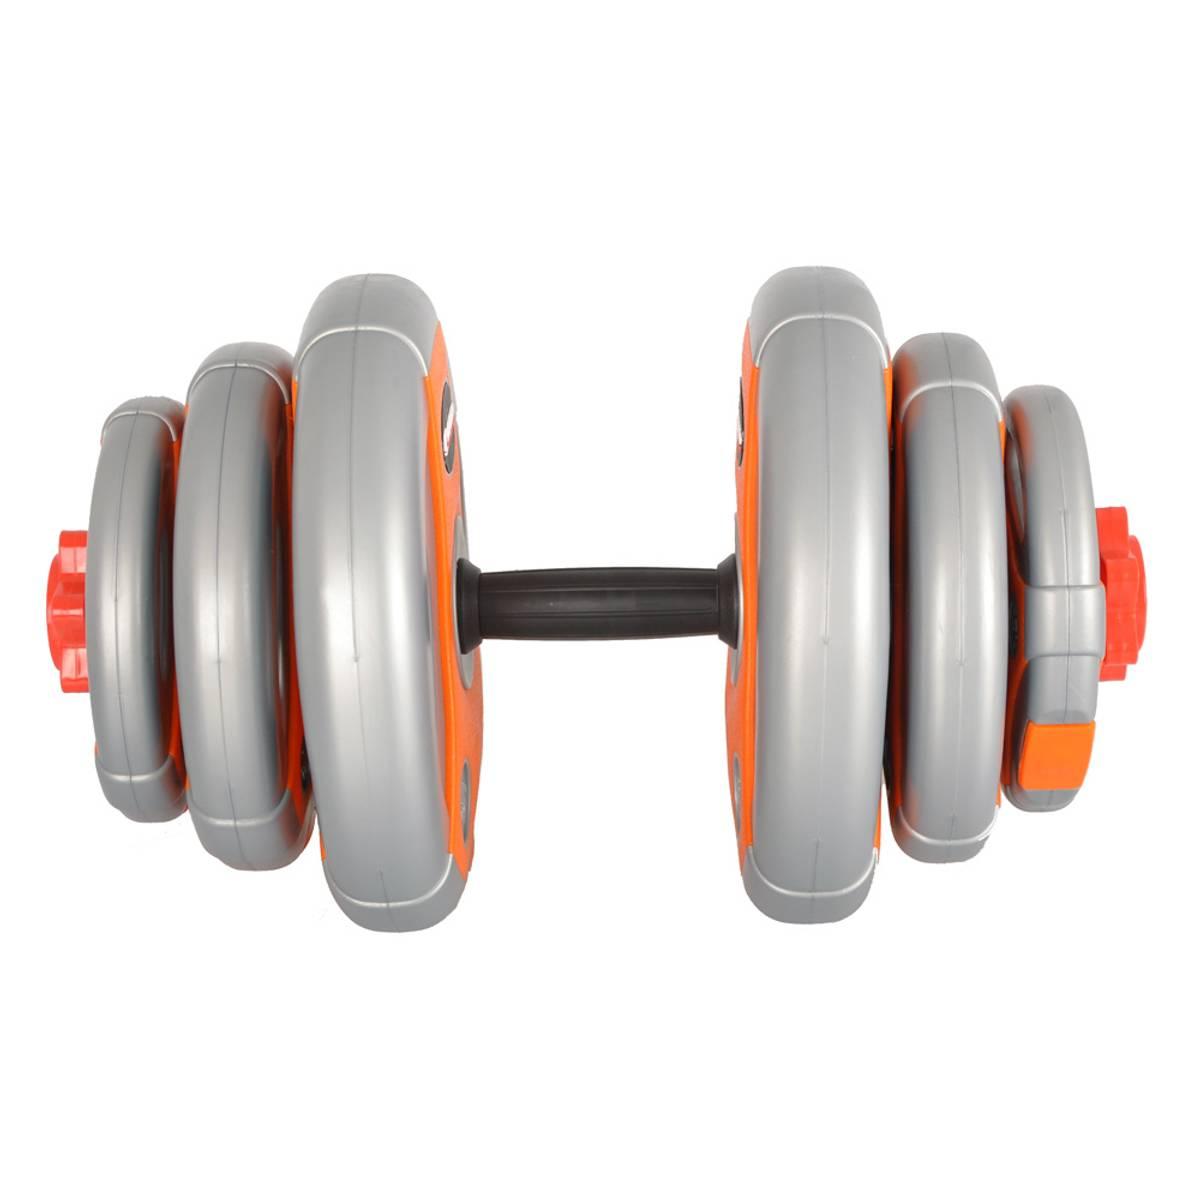 Justerbar manual inSPORTline 3-18 kg